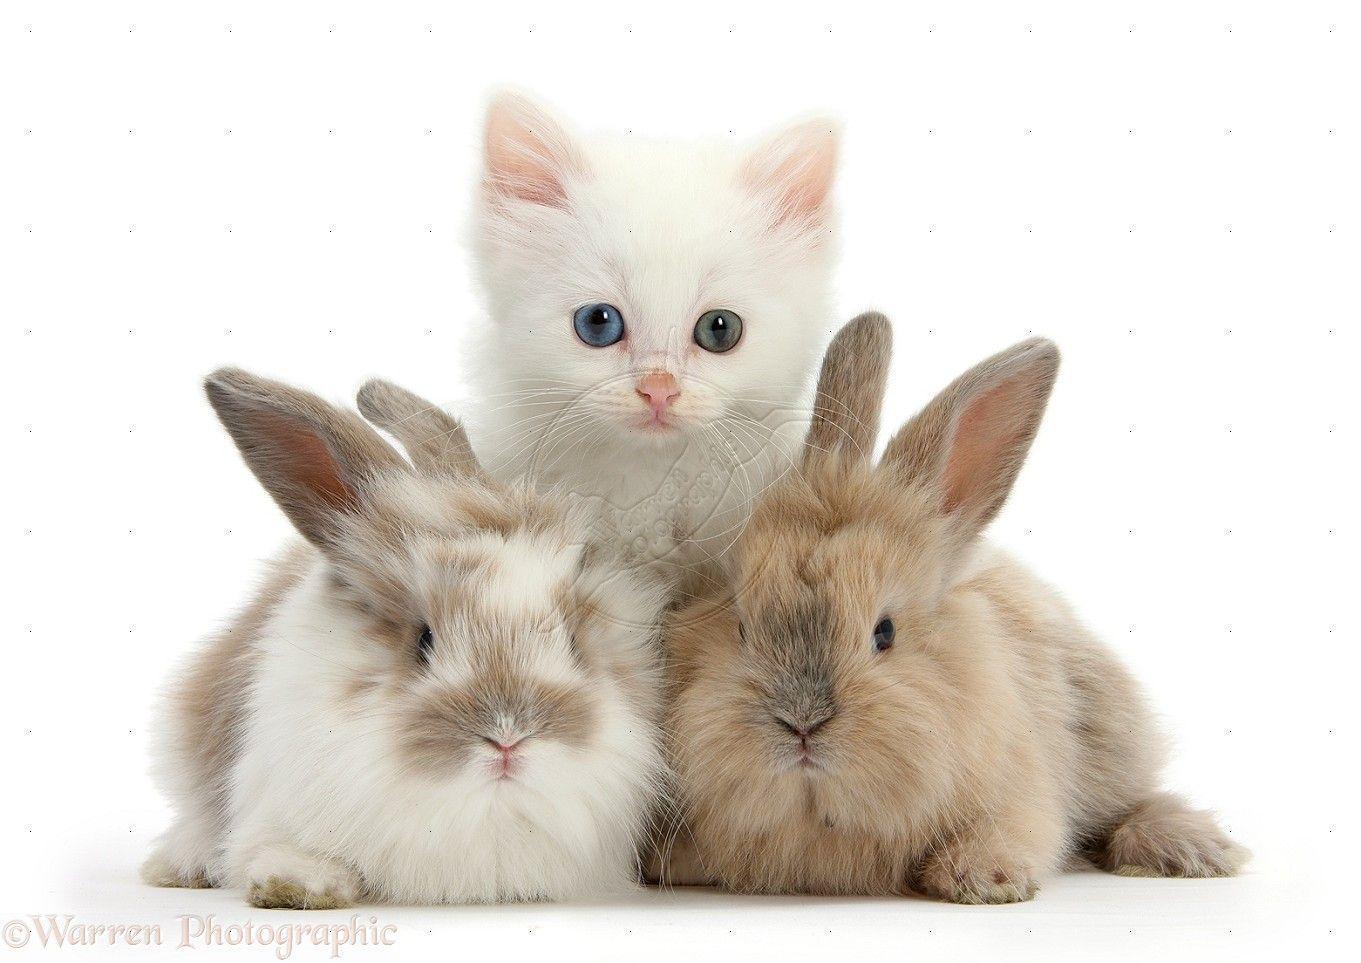 Cute Kitten Desktop Wallpapers - Wallpaper Cave